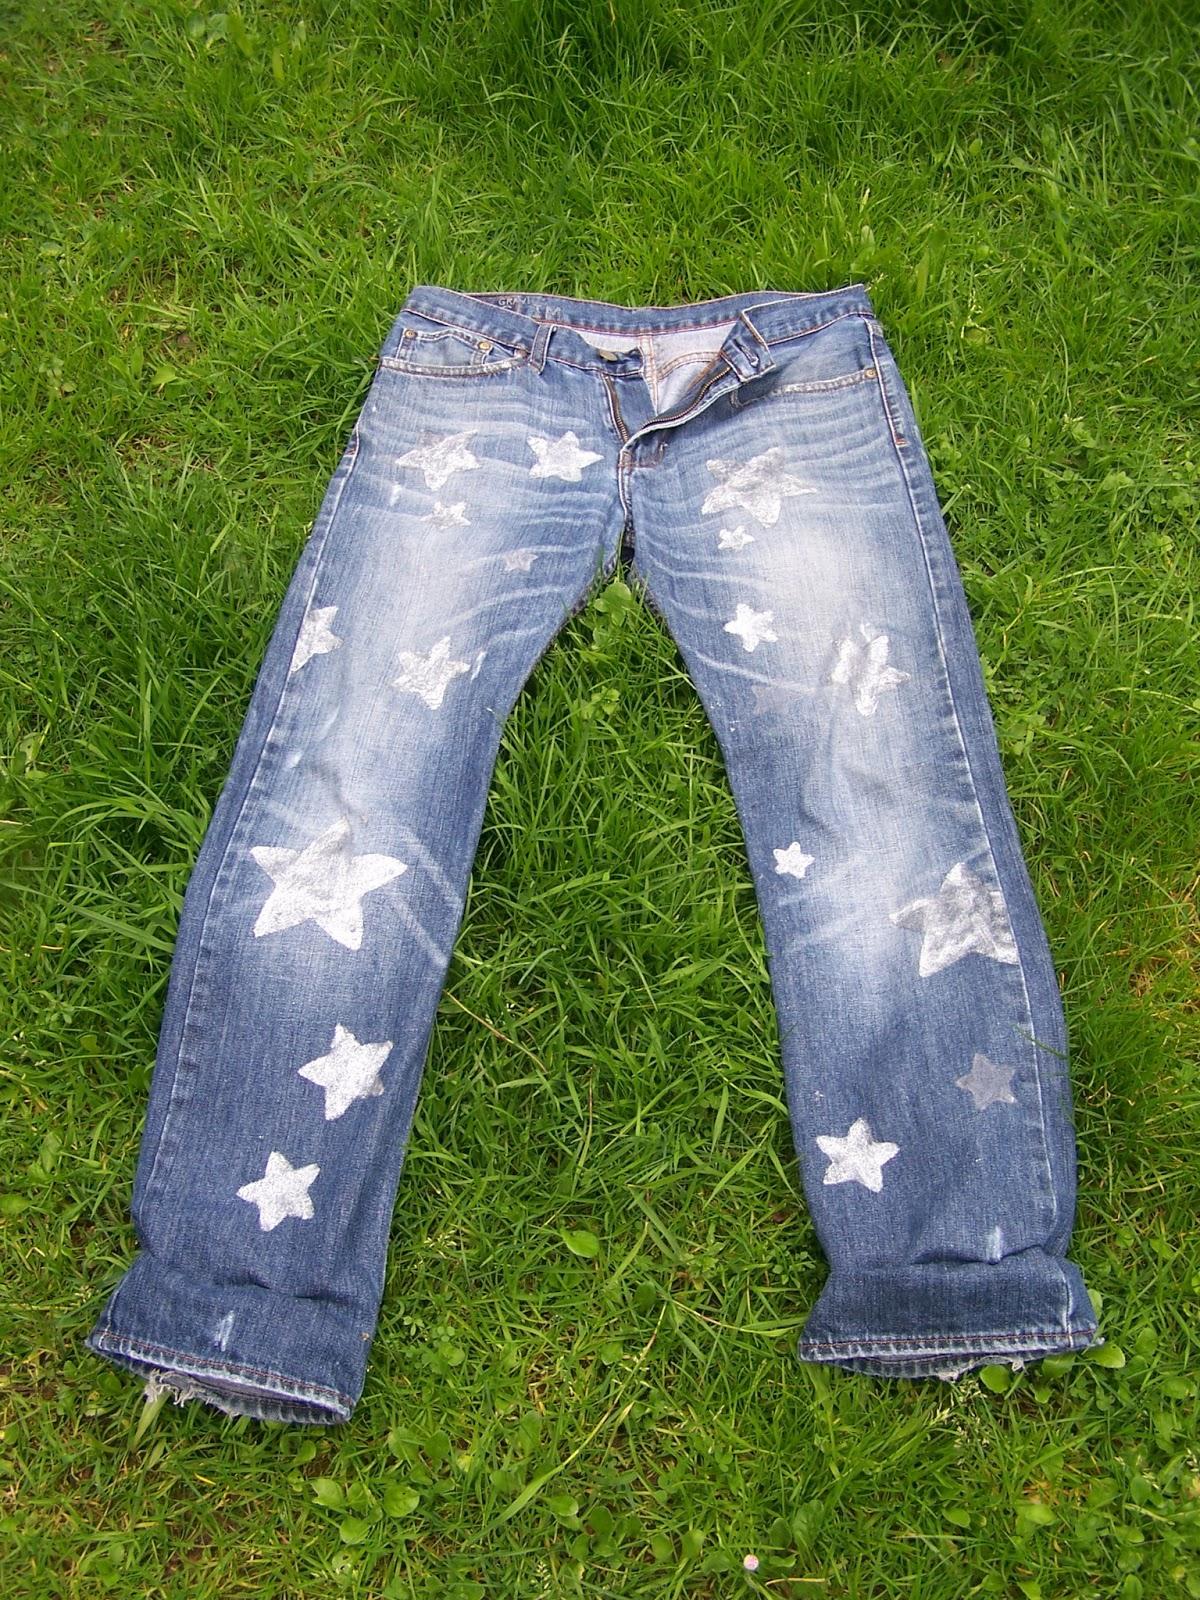 Madialeva Hm Reciclar Jeans Pintura Metalizada